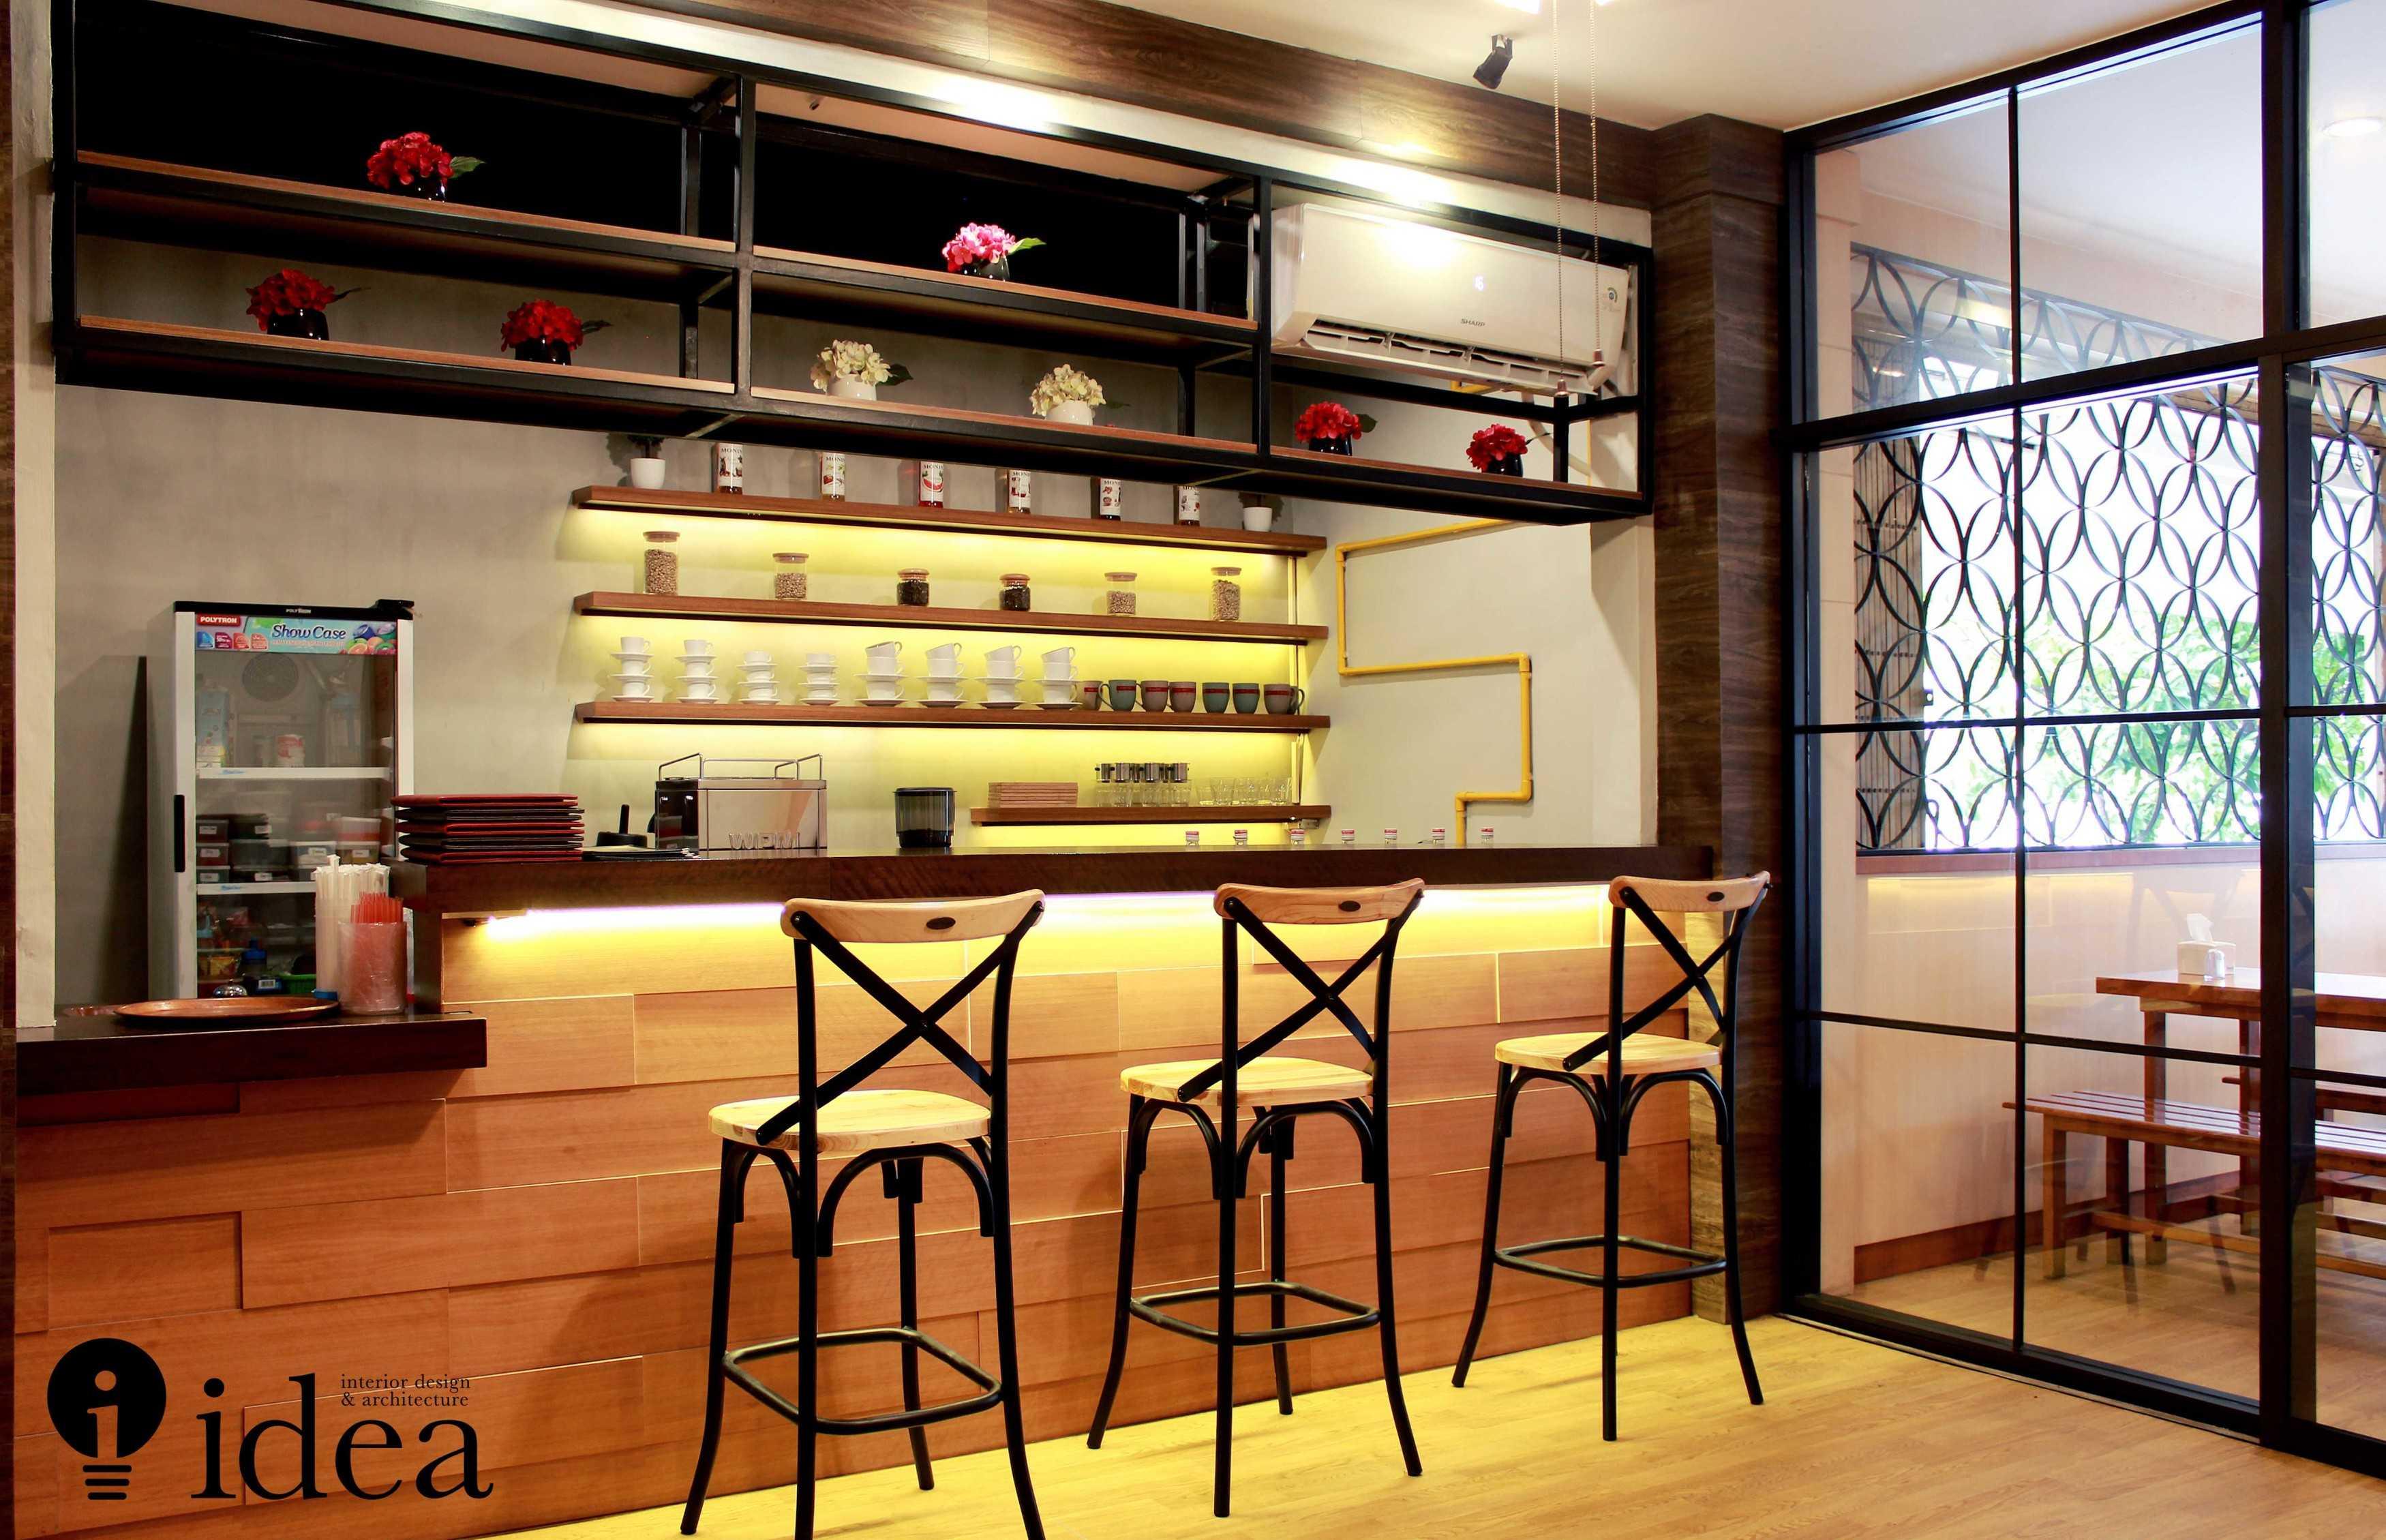 Idea Studio Coffee Bar - Nyonya Attha Surabaya, Kota Sby, Jawa Timur, Indonesia Surabaya, Kota Sby, Jawa Timur, Indonesia Idea-Studio-Coffee-Bar-Nyonya-Attha  <P>Construction Detail.</p> <P>Built Photo</p> 79938